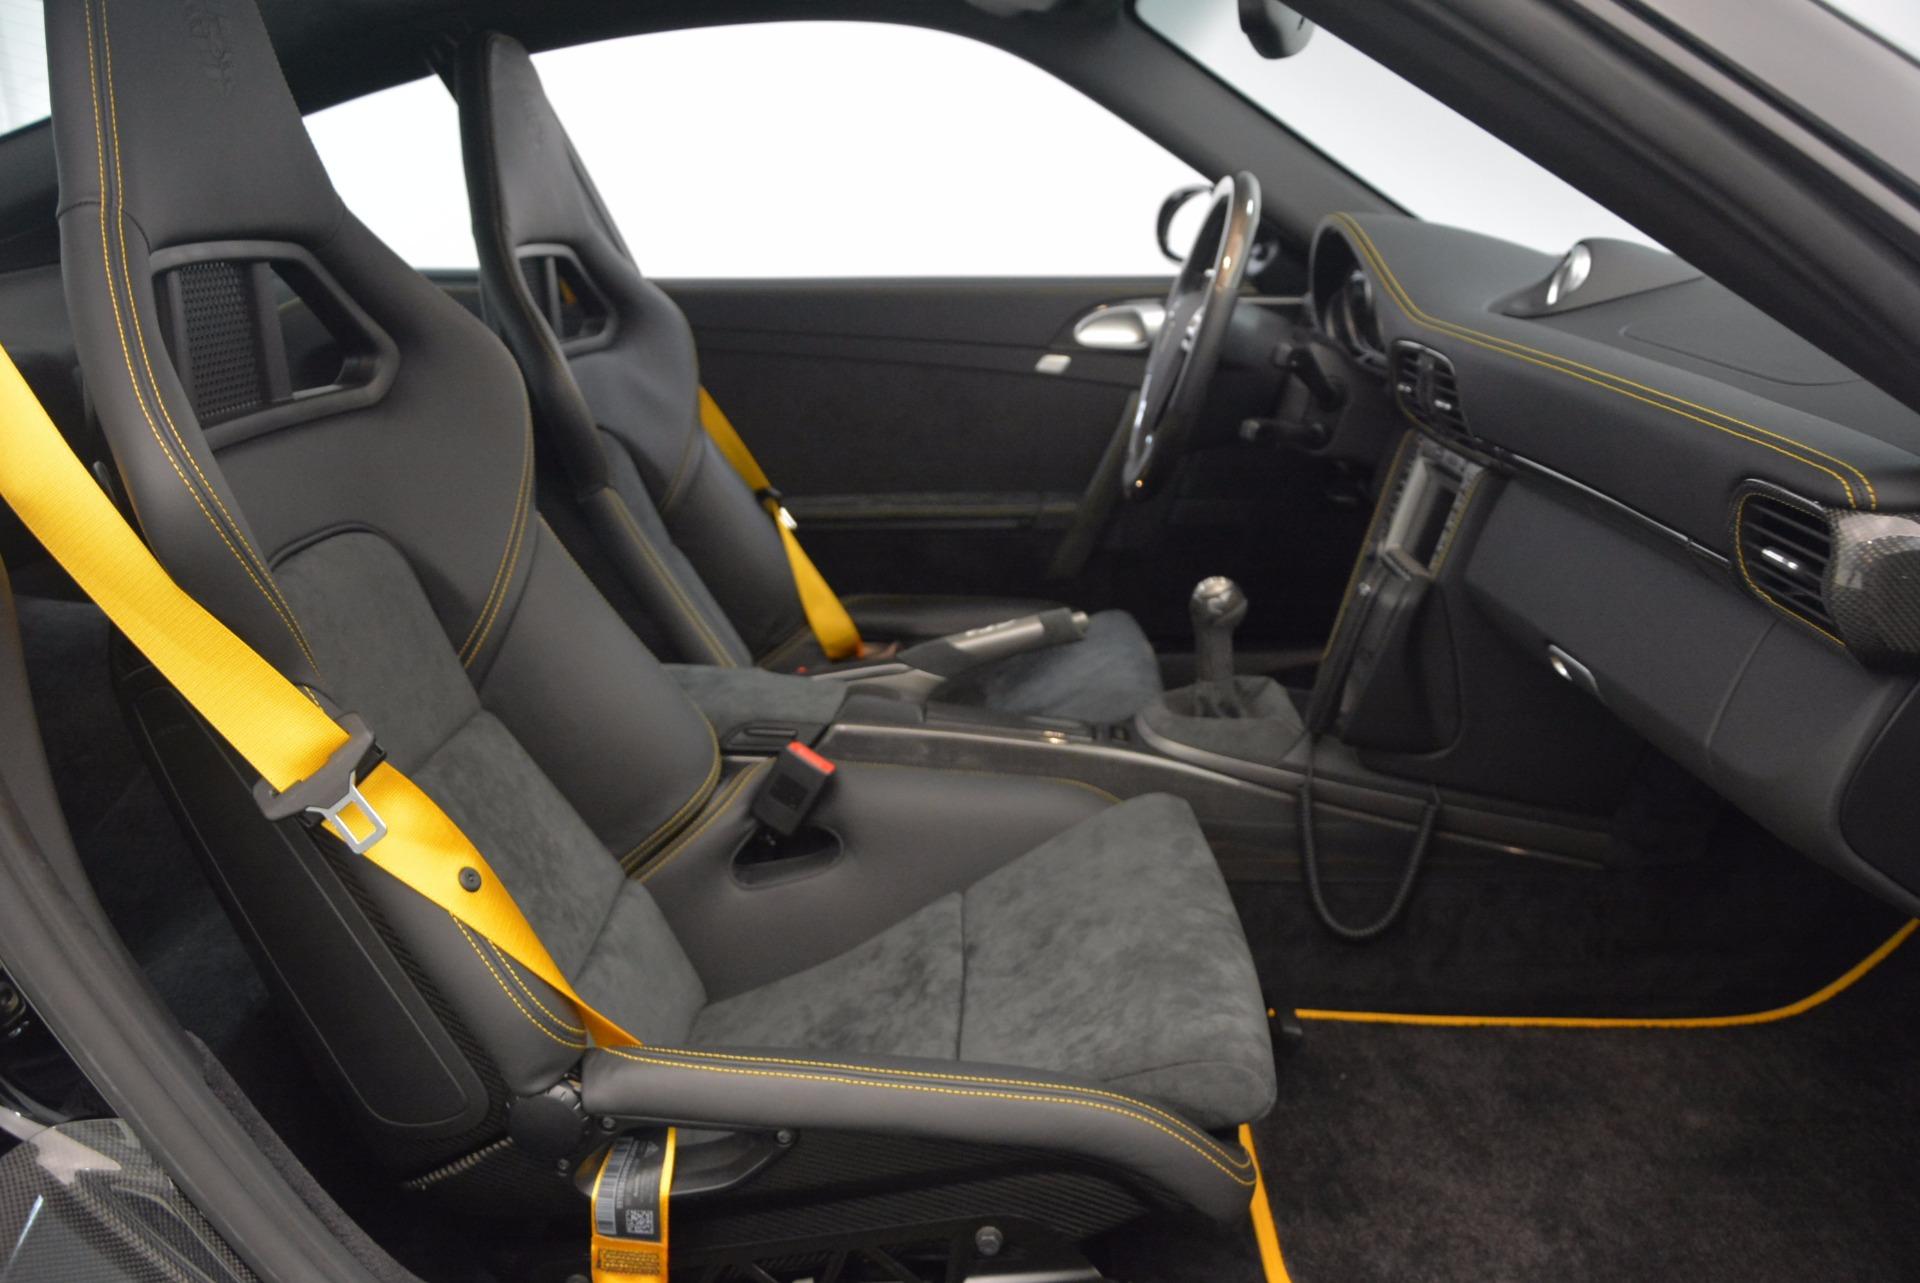 Used 2008 Porsche 911 GT2 For Sale In Greenwich, CT. Alfa Romeo of Greenwich, 7239 1400_p18